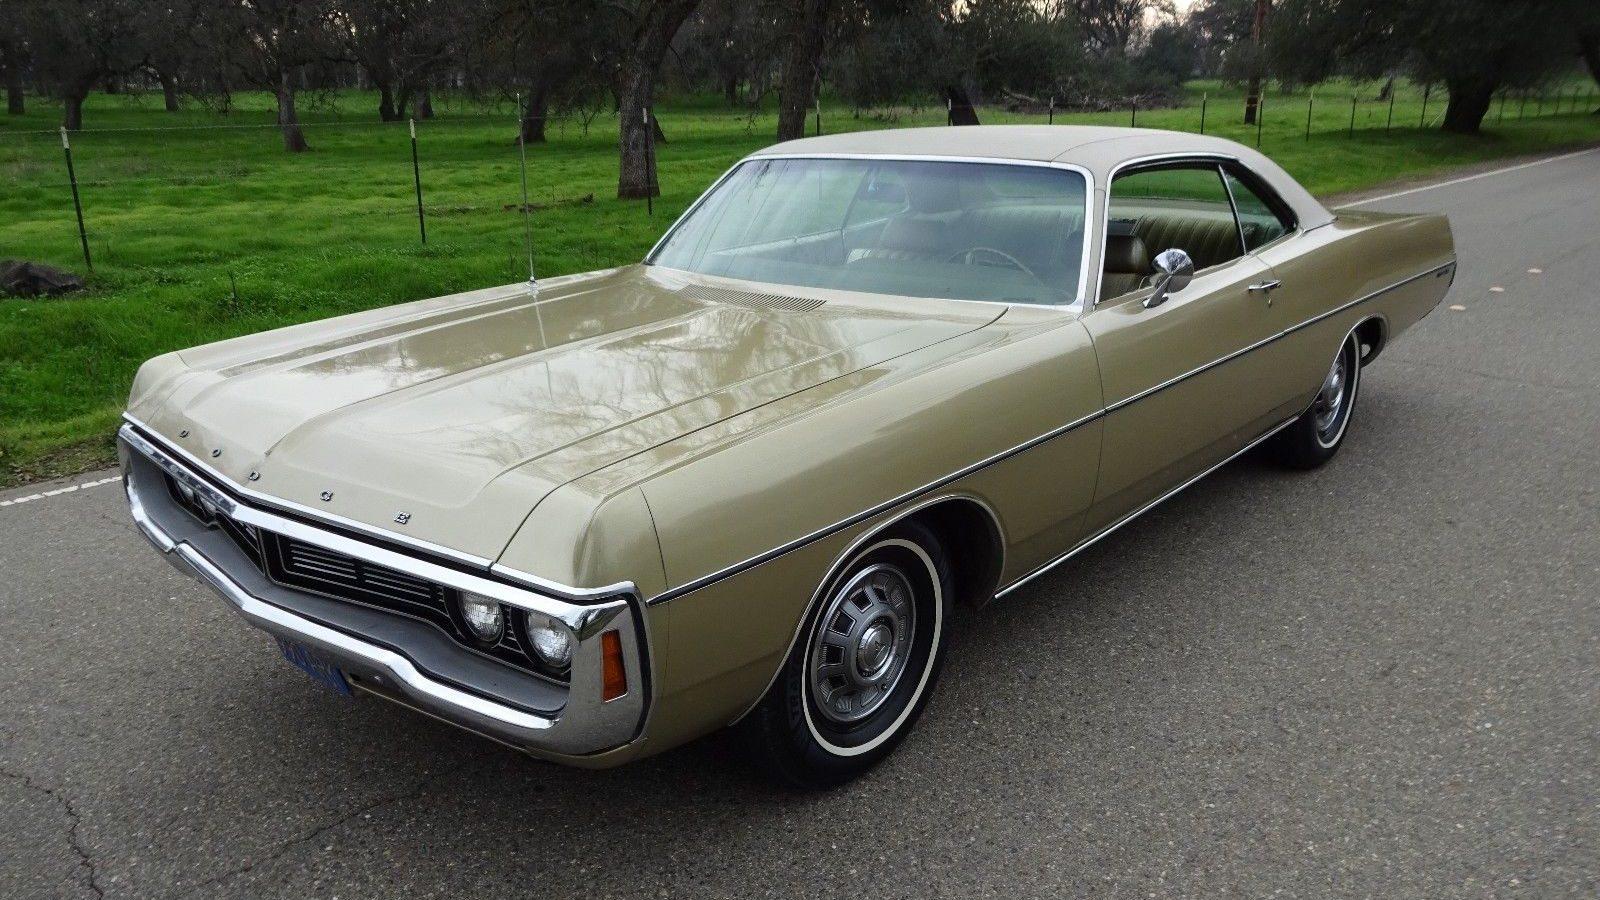 Time Capsule! 1970 Dodge Polara Survivor